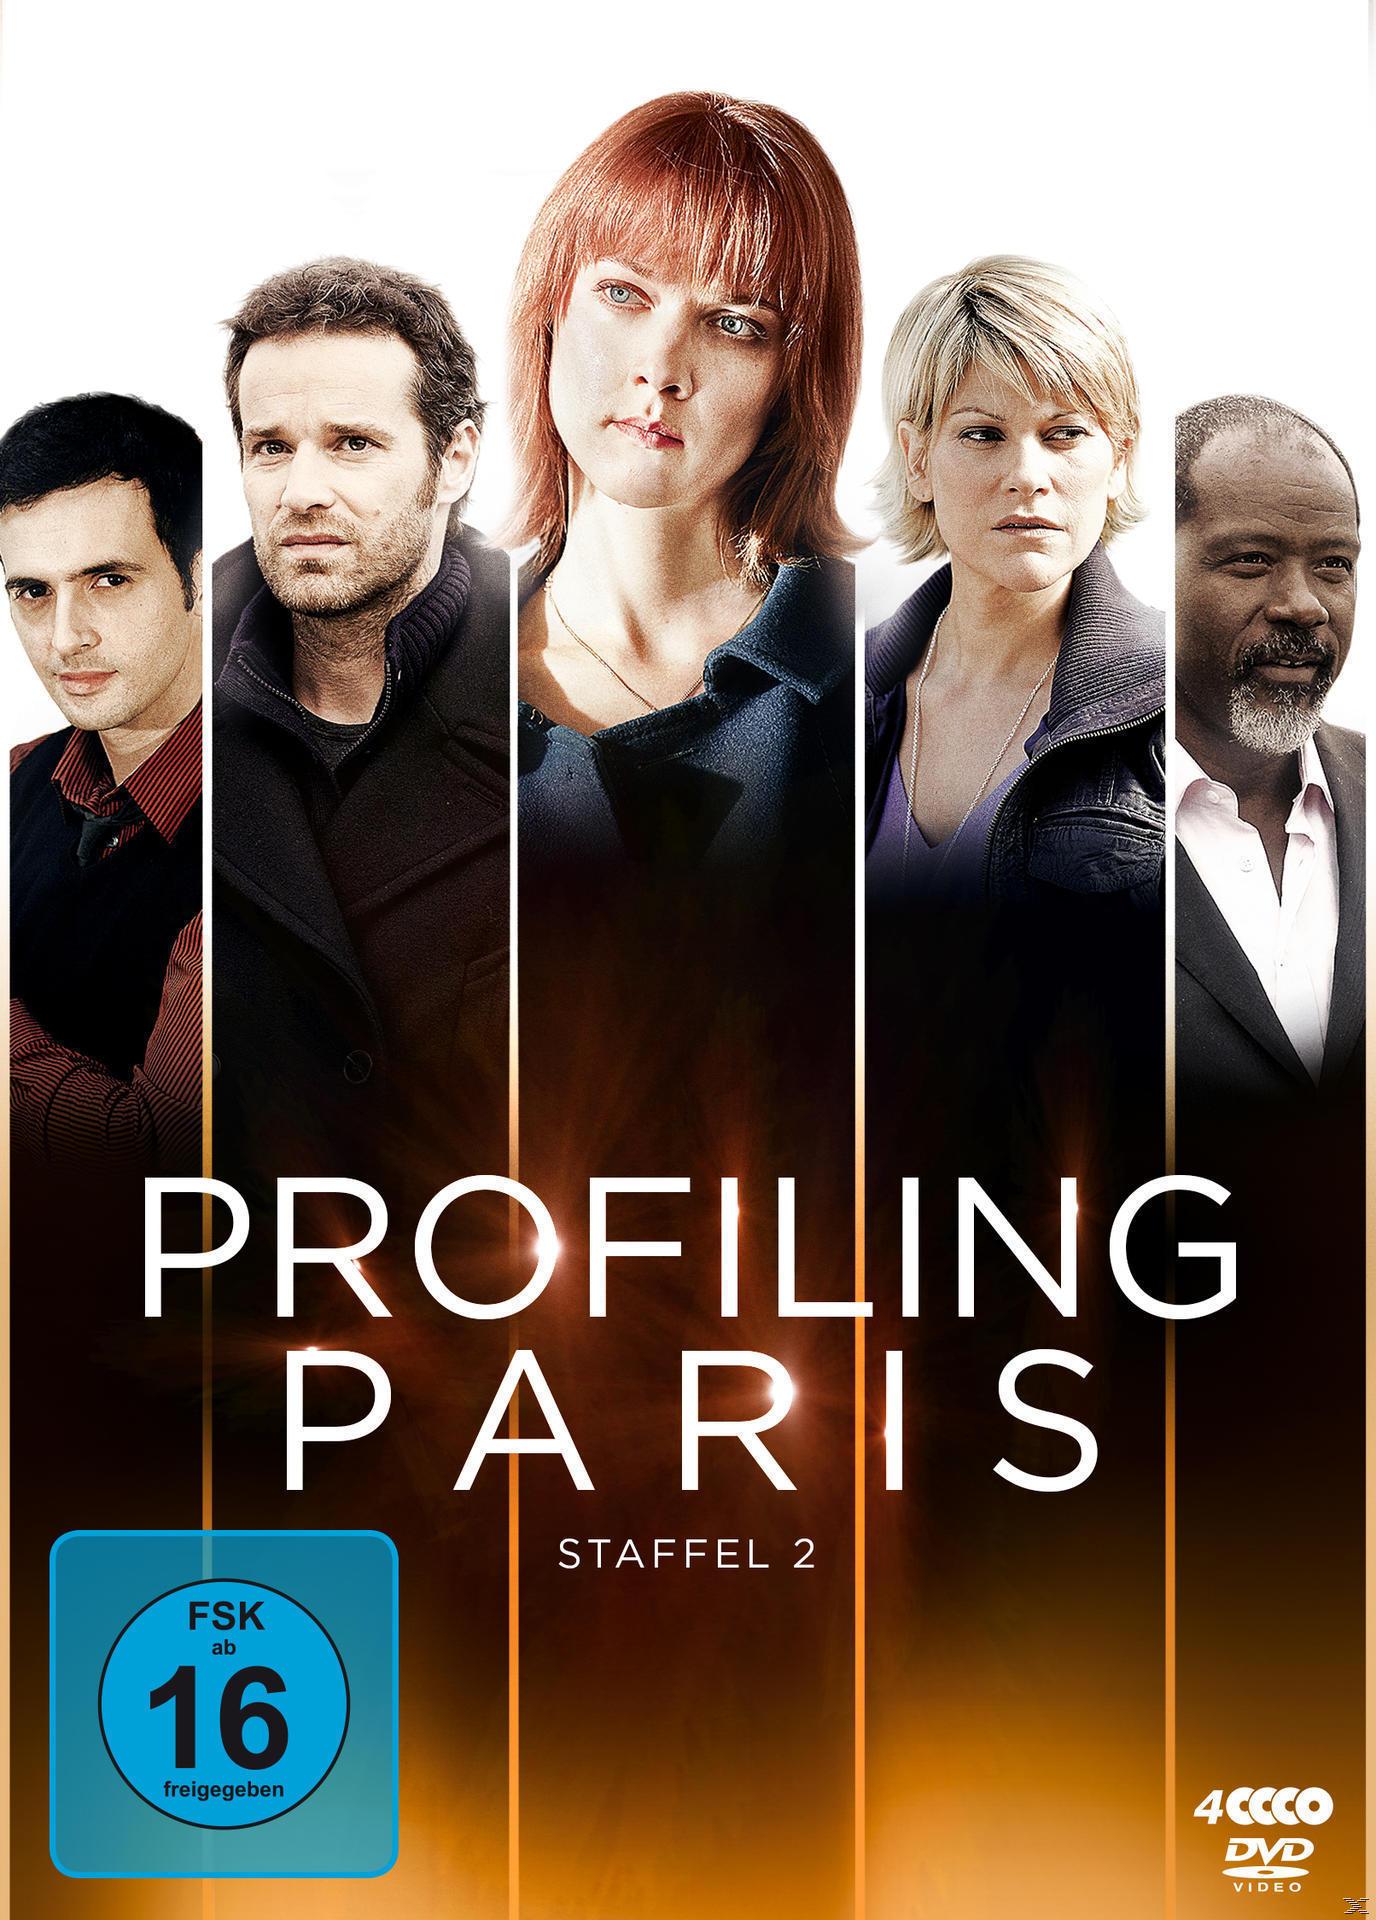 Profiling Paris - Staffel 2 DVD-Box (DVD) für 16,99 Euro